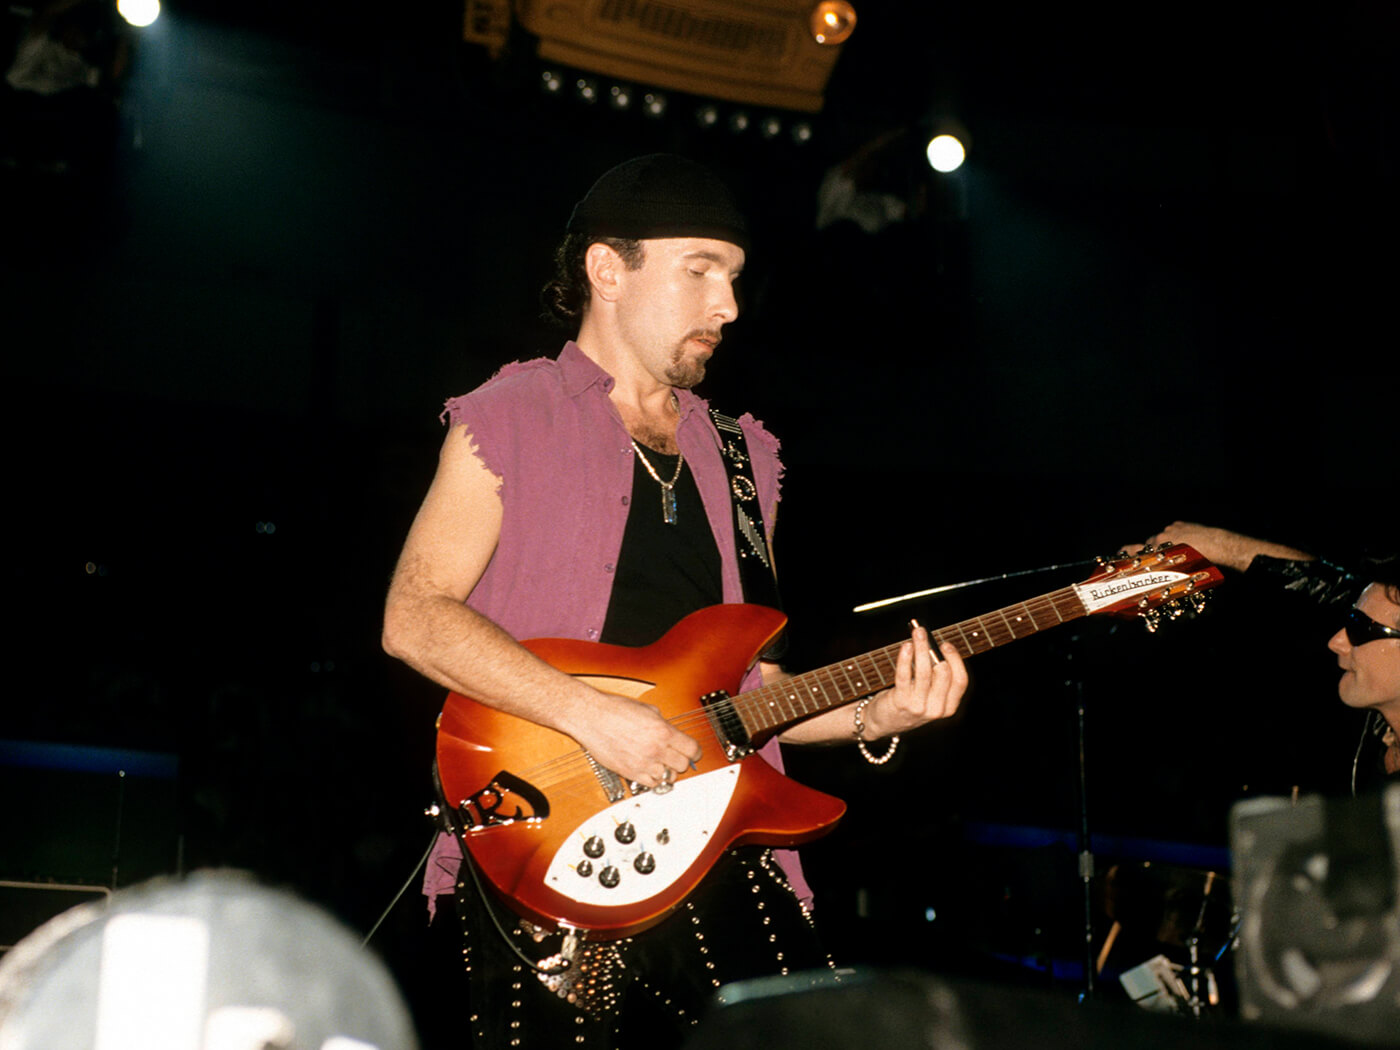 The Edge of U2